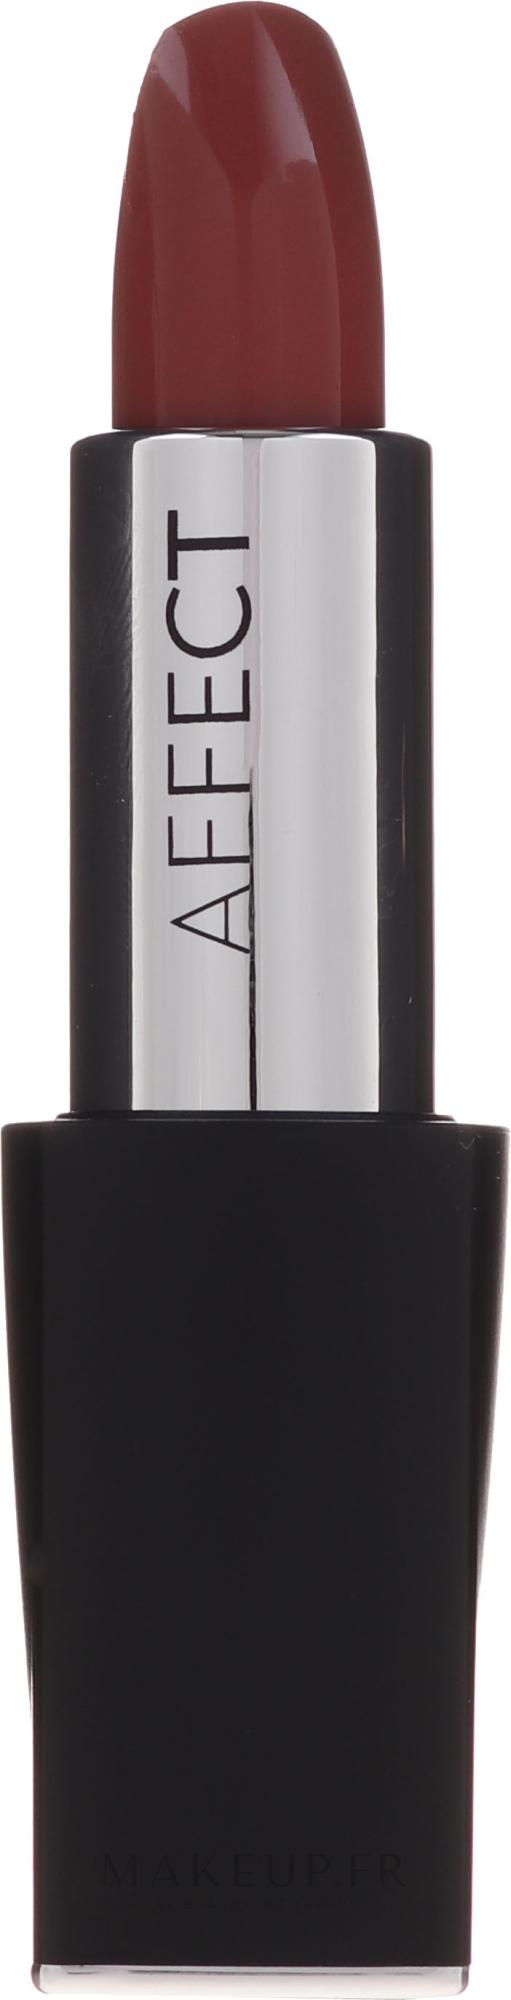 Rouge à lèvres - Affect Cosmetics Macadamia Oil Satin Lipstick — Photo Simple Plan